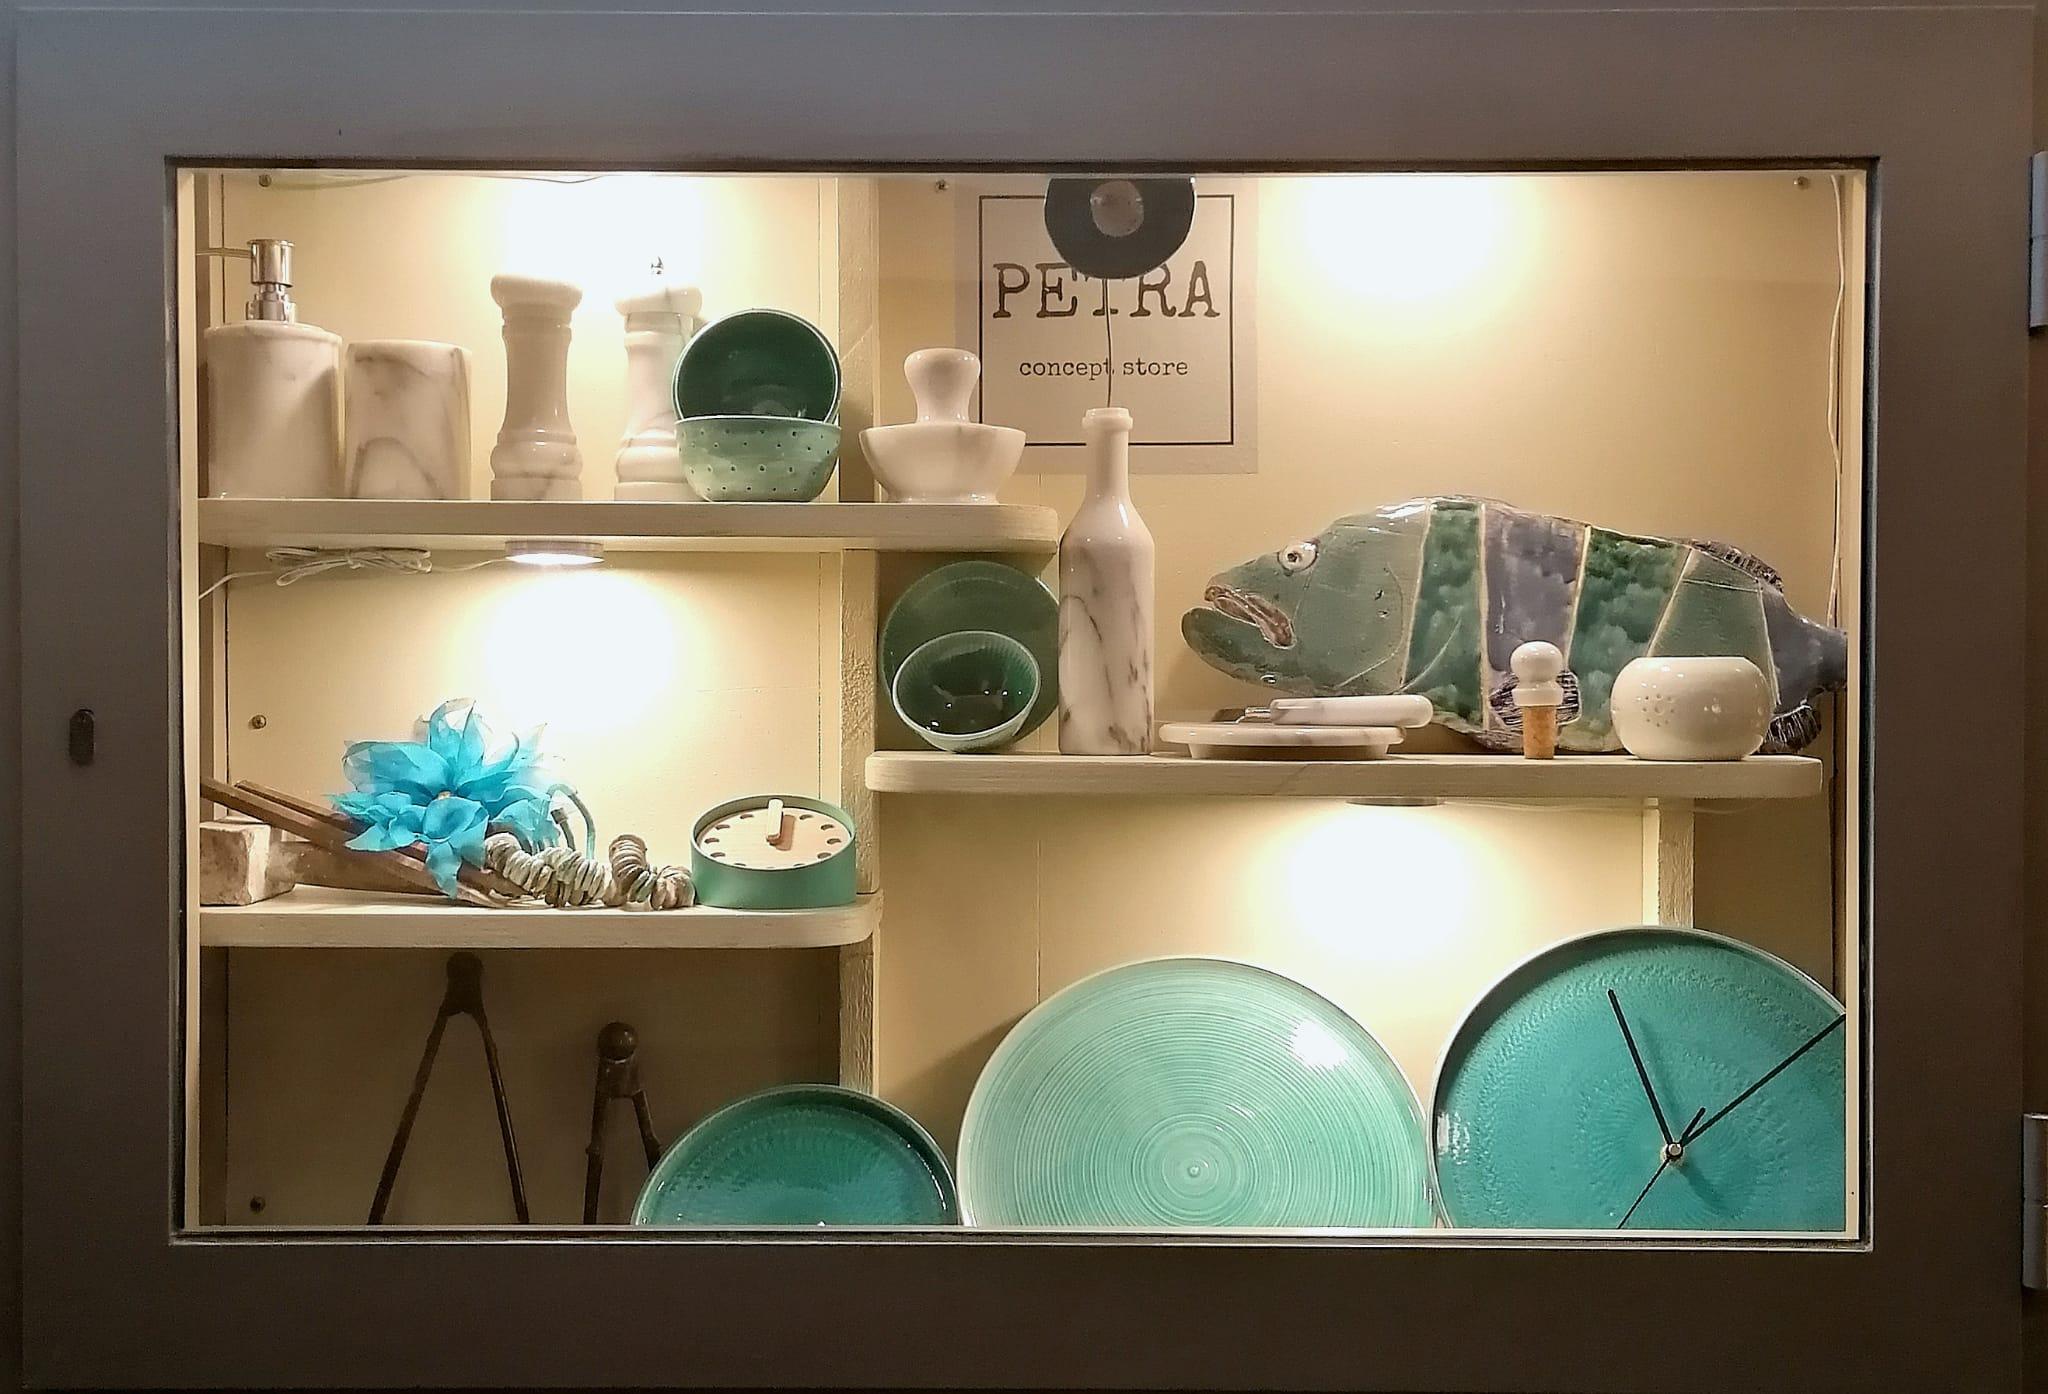 Petra Concept Store, la boutique del Made in Italy